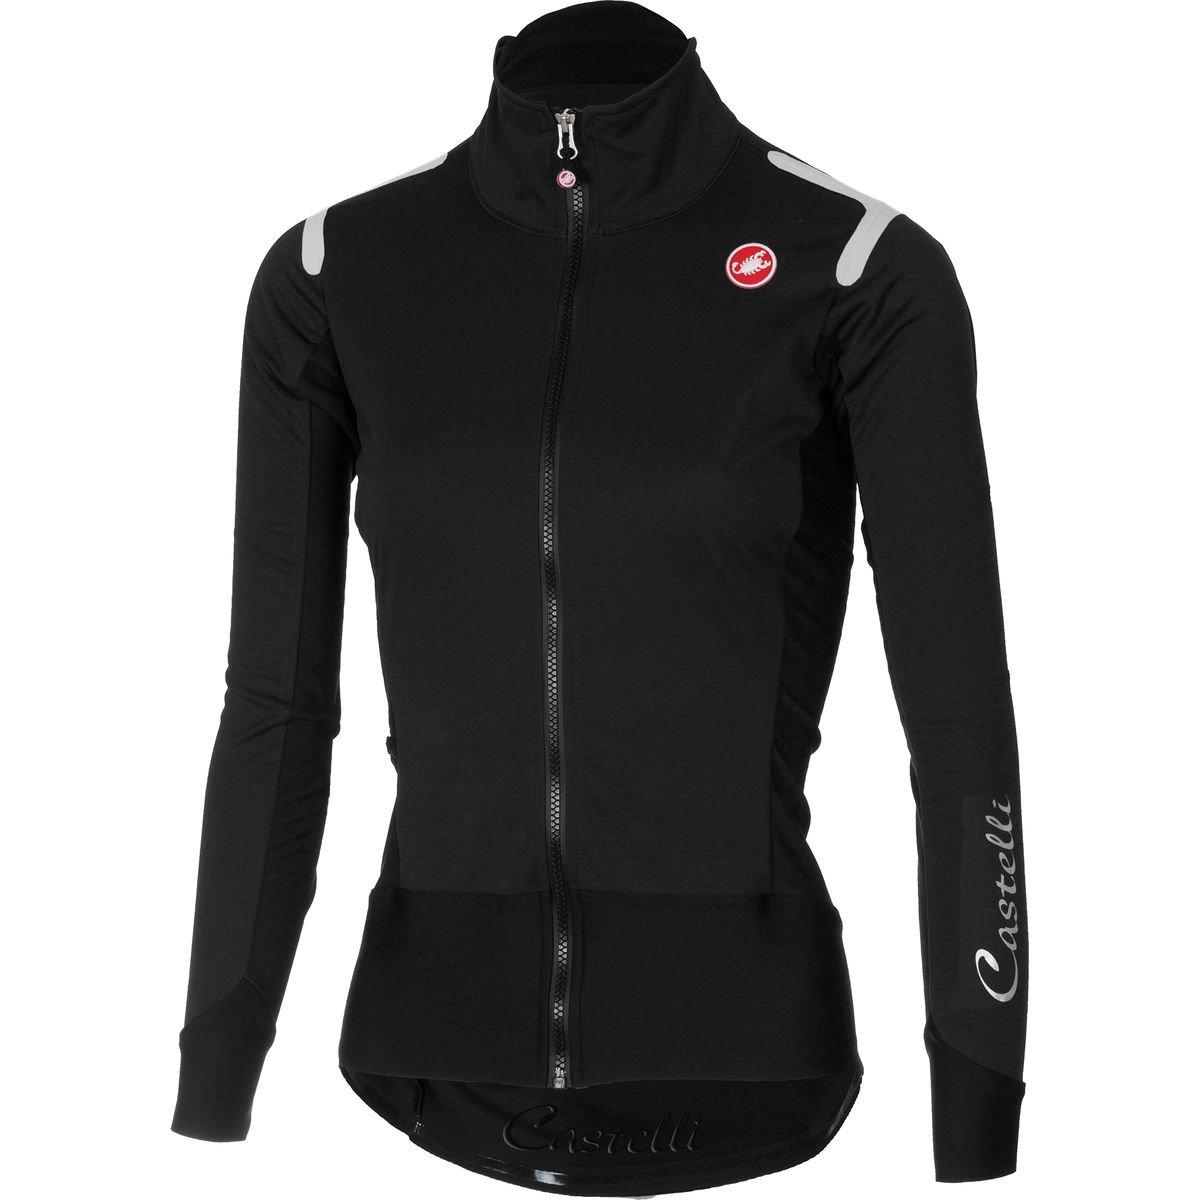 Castelli Alpha ROS Long-Sleeve Jersey - Women's Light Black/Black, XS